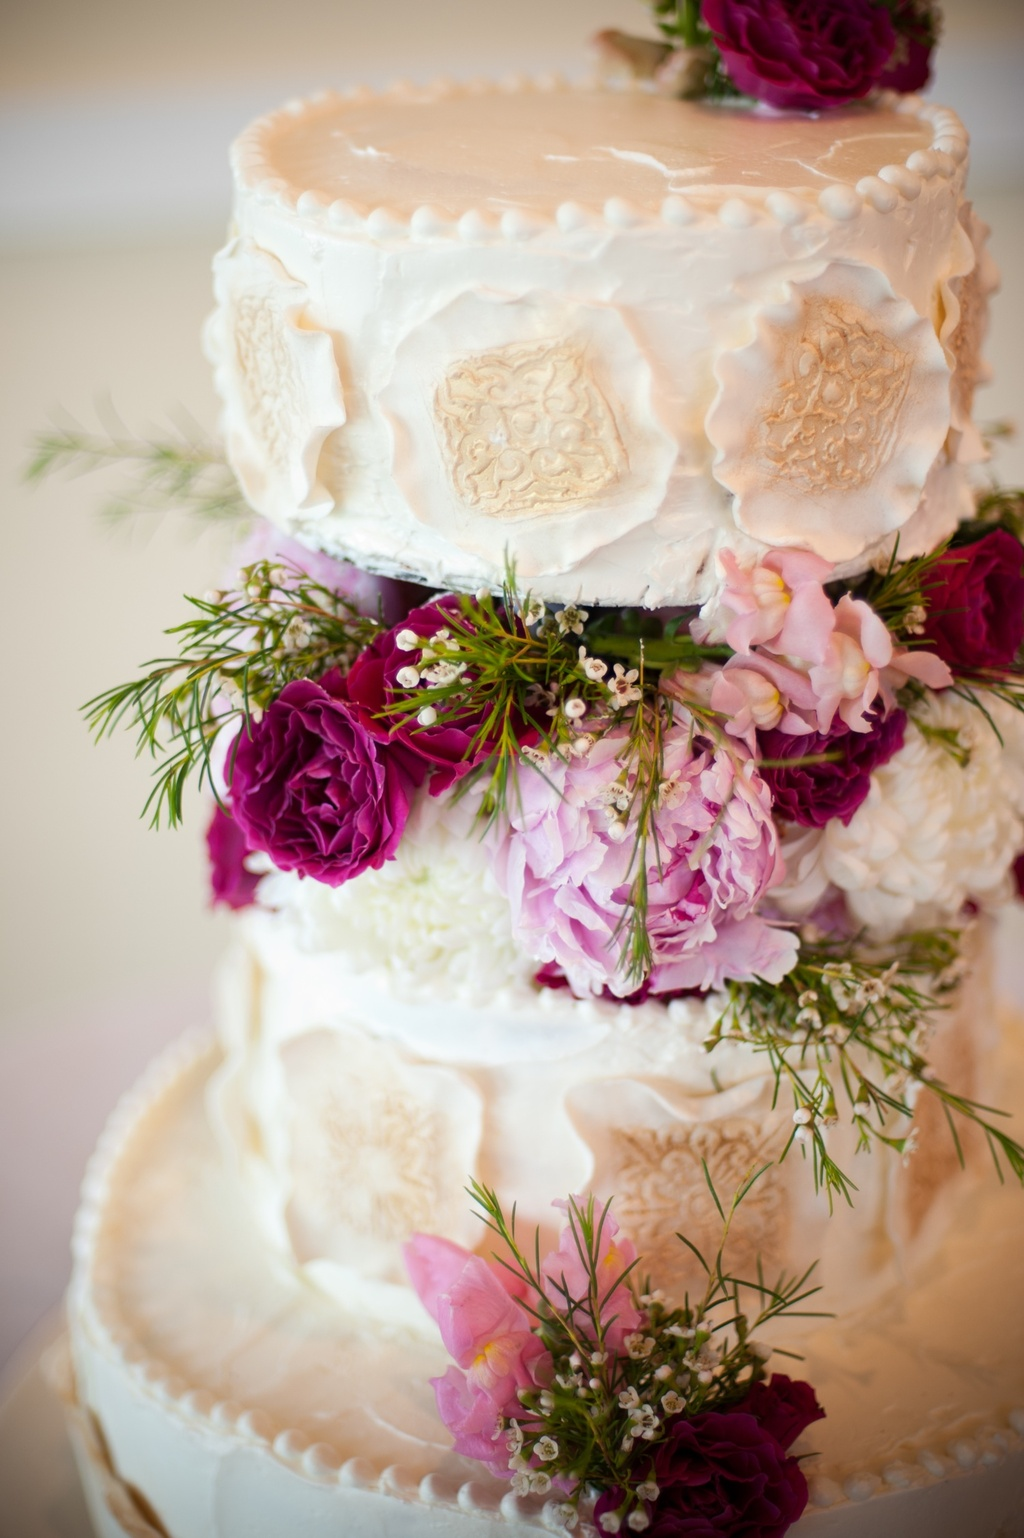 Elegant-wedding-cake-pink-wedding-flowers.full